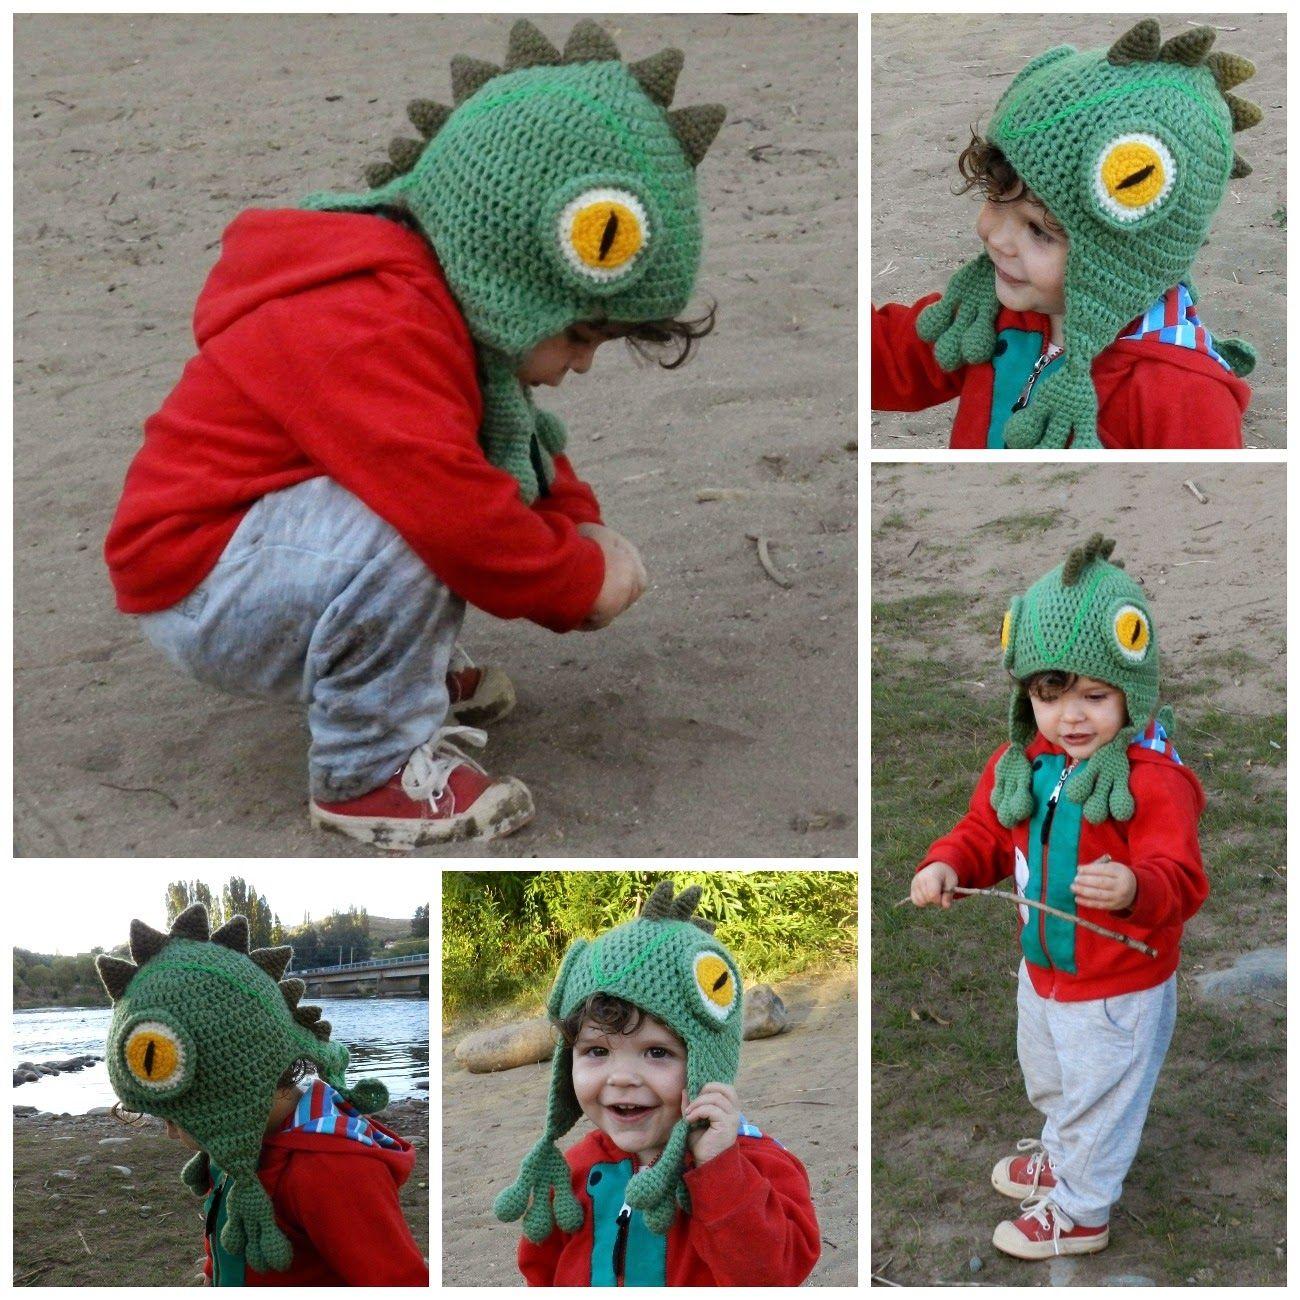 daxa rabalea: Gorro iguana - patrón gratis | Amigurumis | Pinterest ...